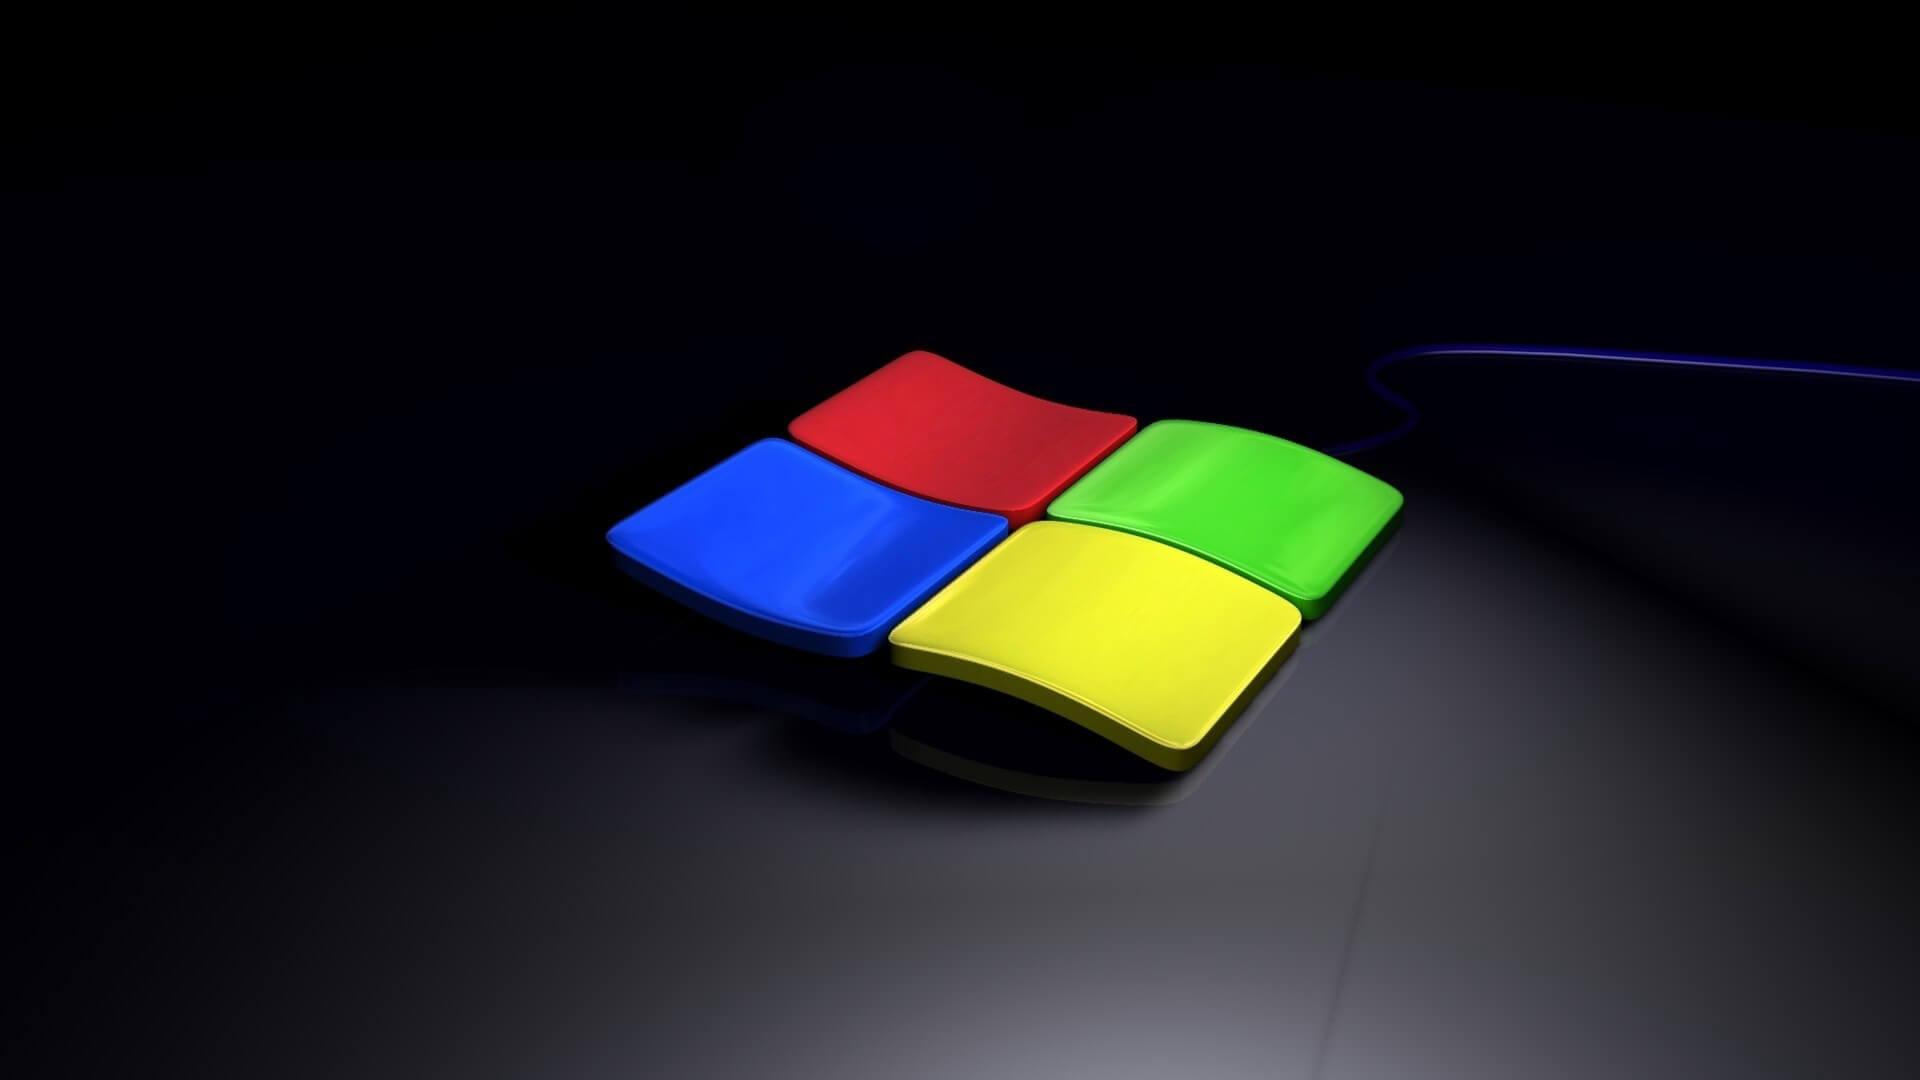 Windows Black Background Screen Saver 1920x1080